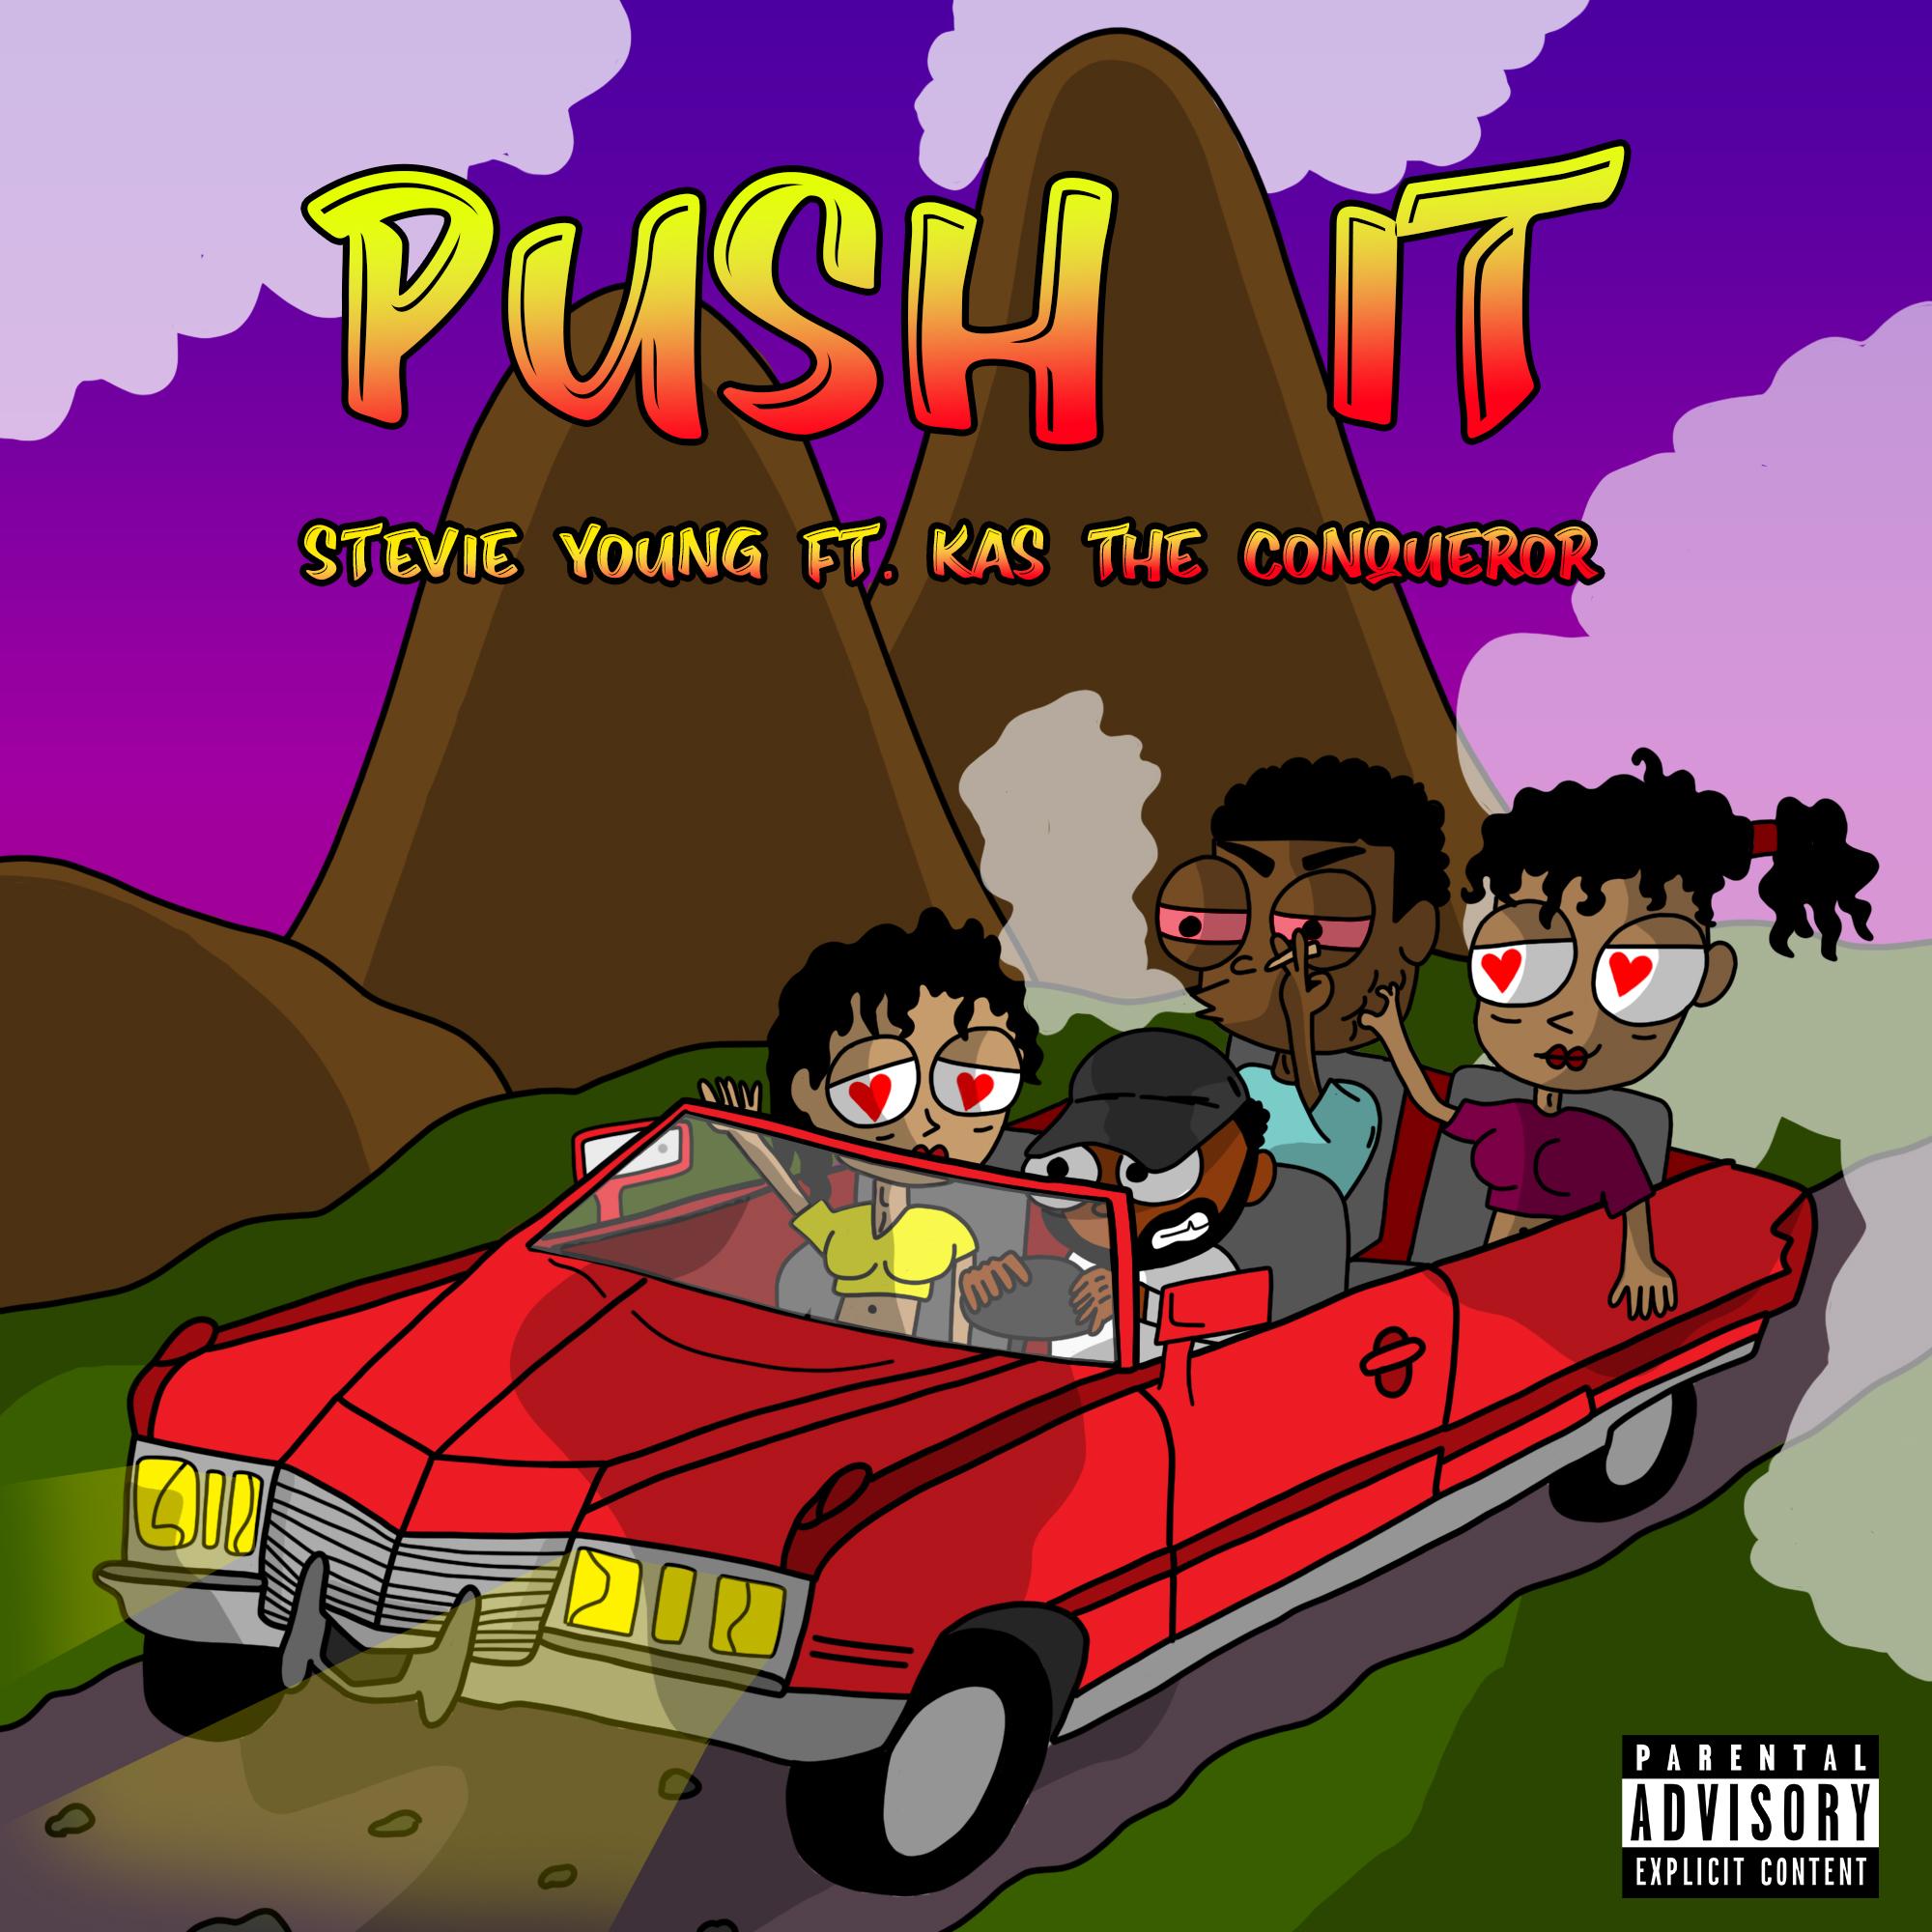 Stevevie Young - Push it img_6883-1562422635.jpg